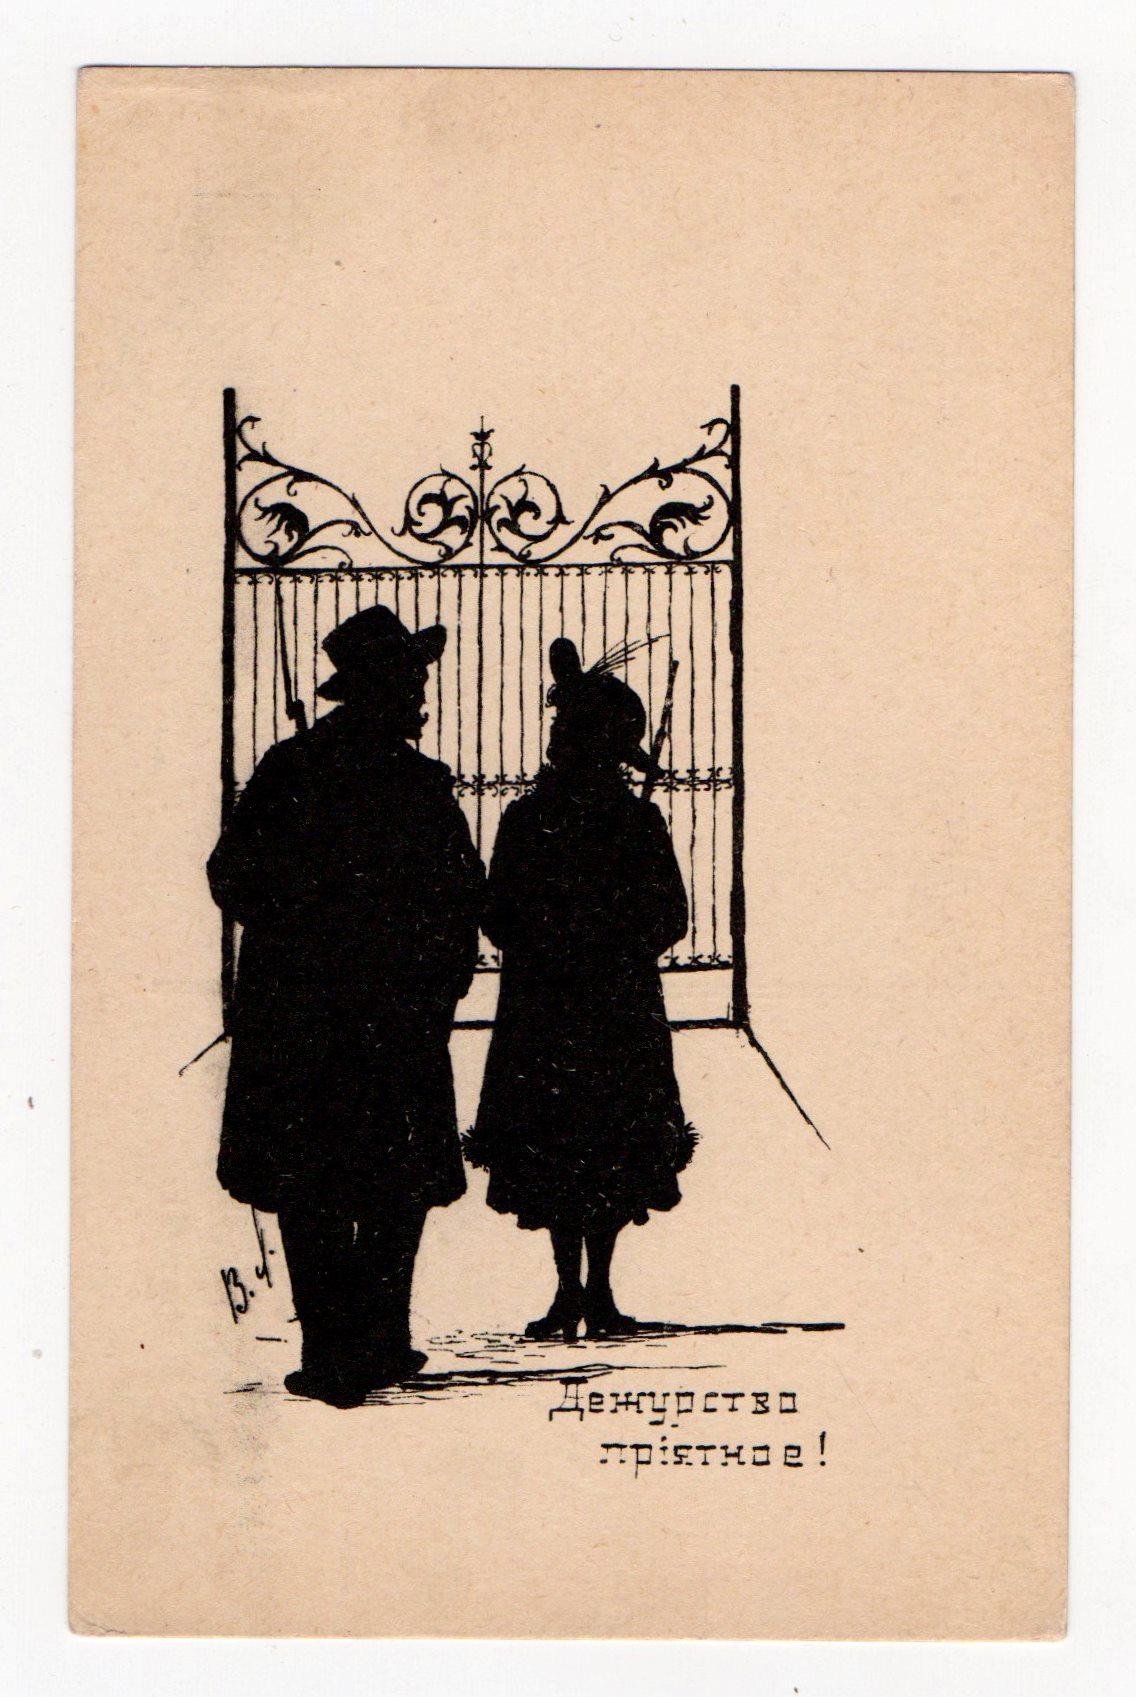 "Поштова листівка. """"Дежурство пріятное!"". Худ. В. Л. Къ событіямъ въ КіевѢ въ январѢ и февралѢ 1918 г."""